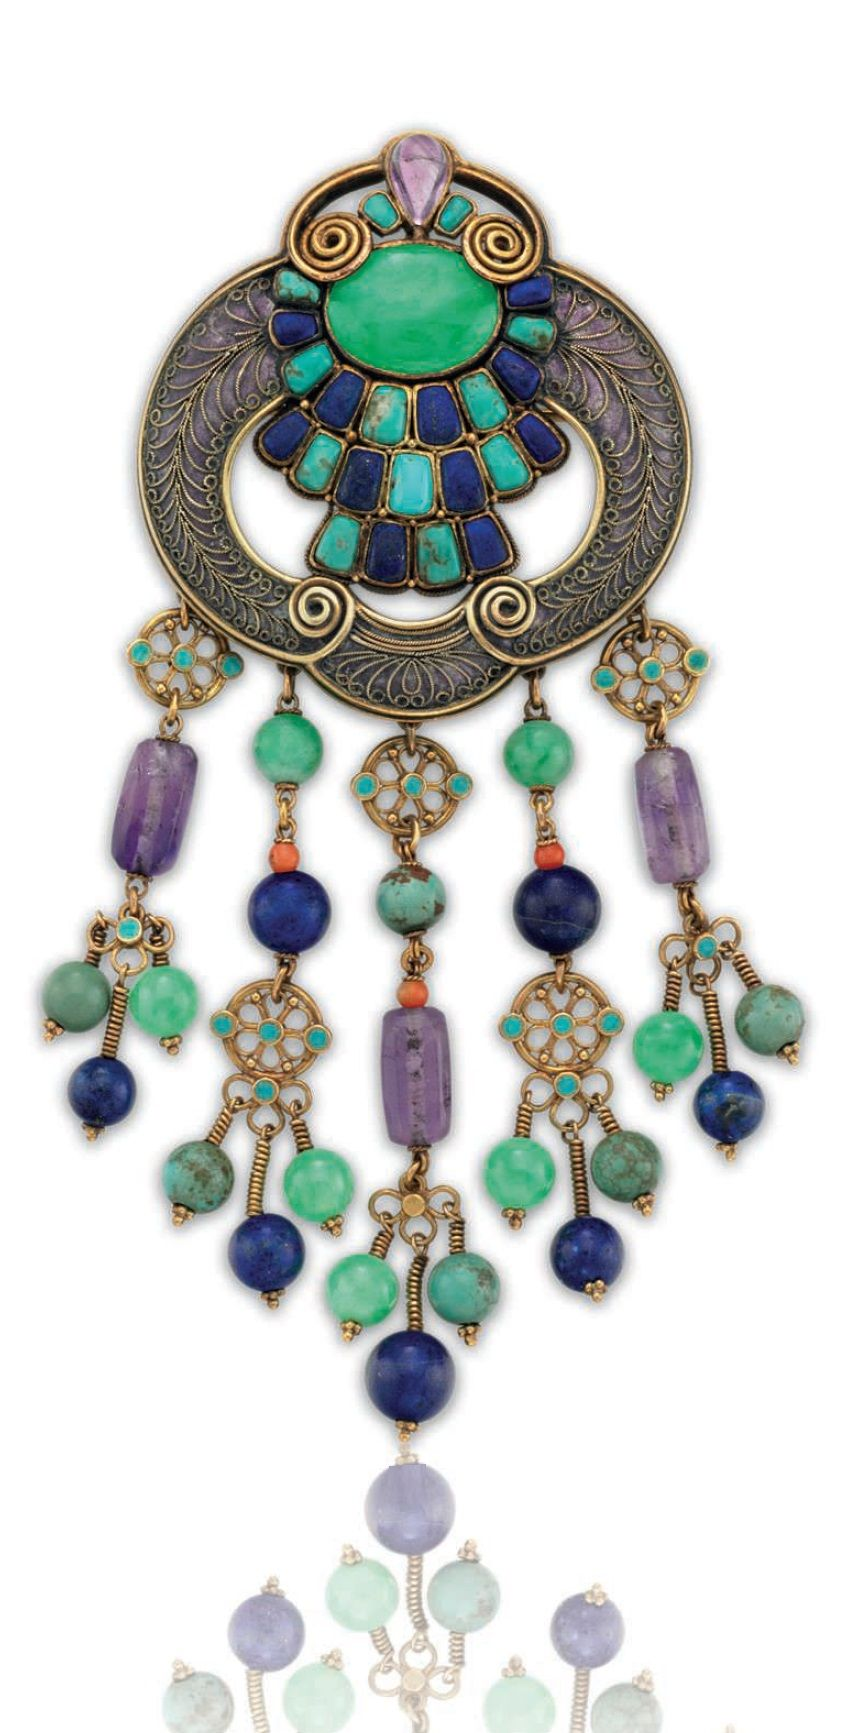 Louis Comfort Tiffany Tiffany Co A Multi Gem Enamel And Gold Brooch Circa 1920 Set With Gemstone Brooch Tiffany Jewelry Art Nouveau Jewelry